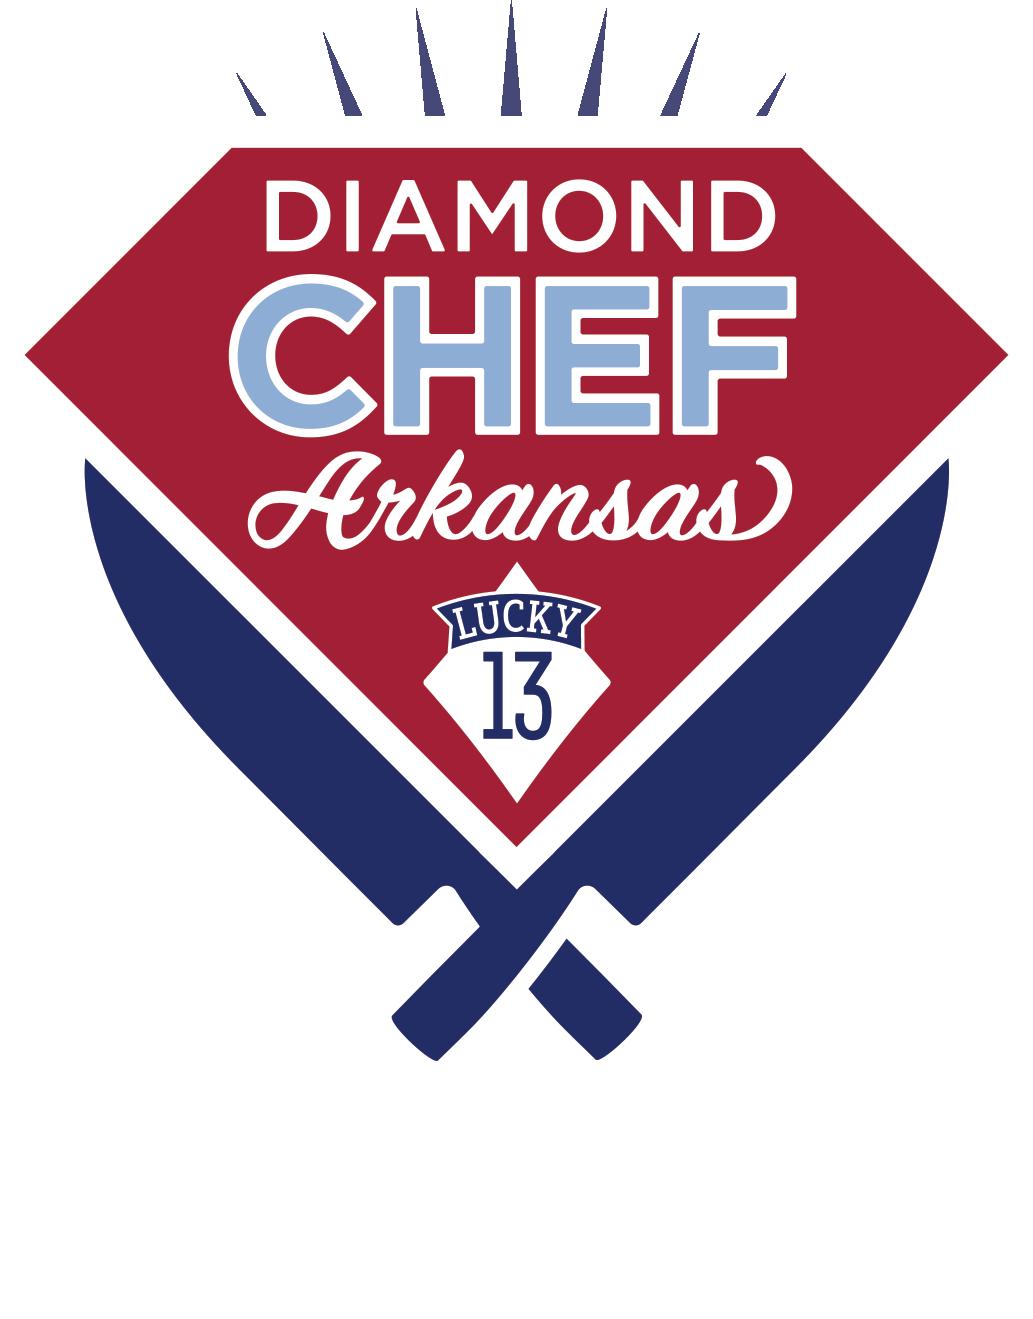 Diamond Chef